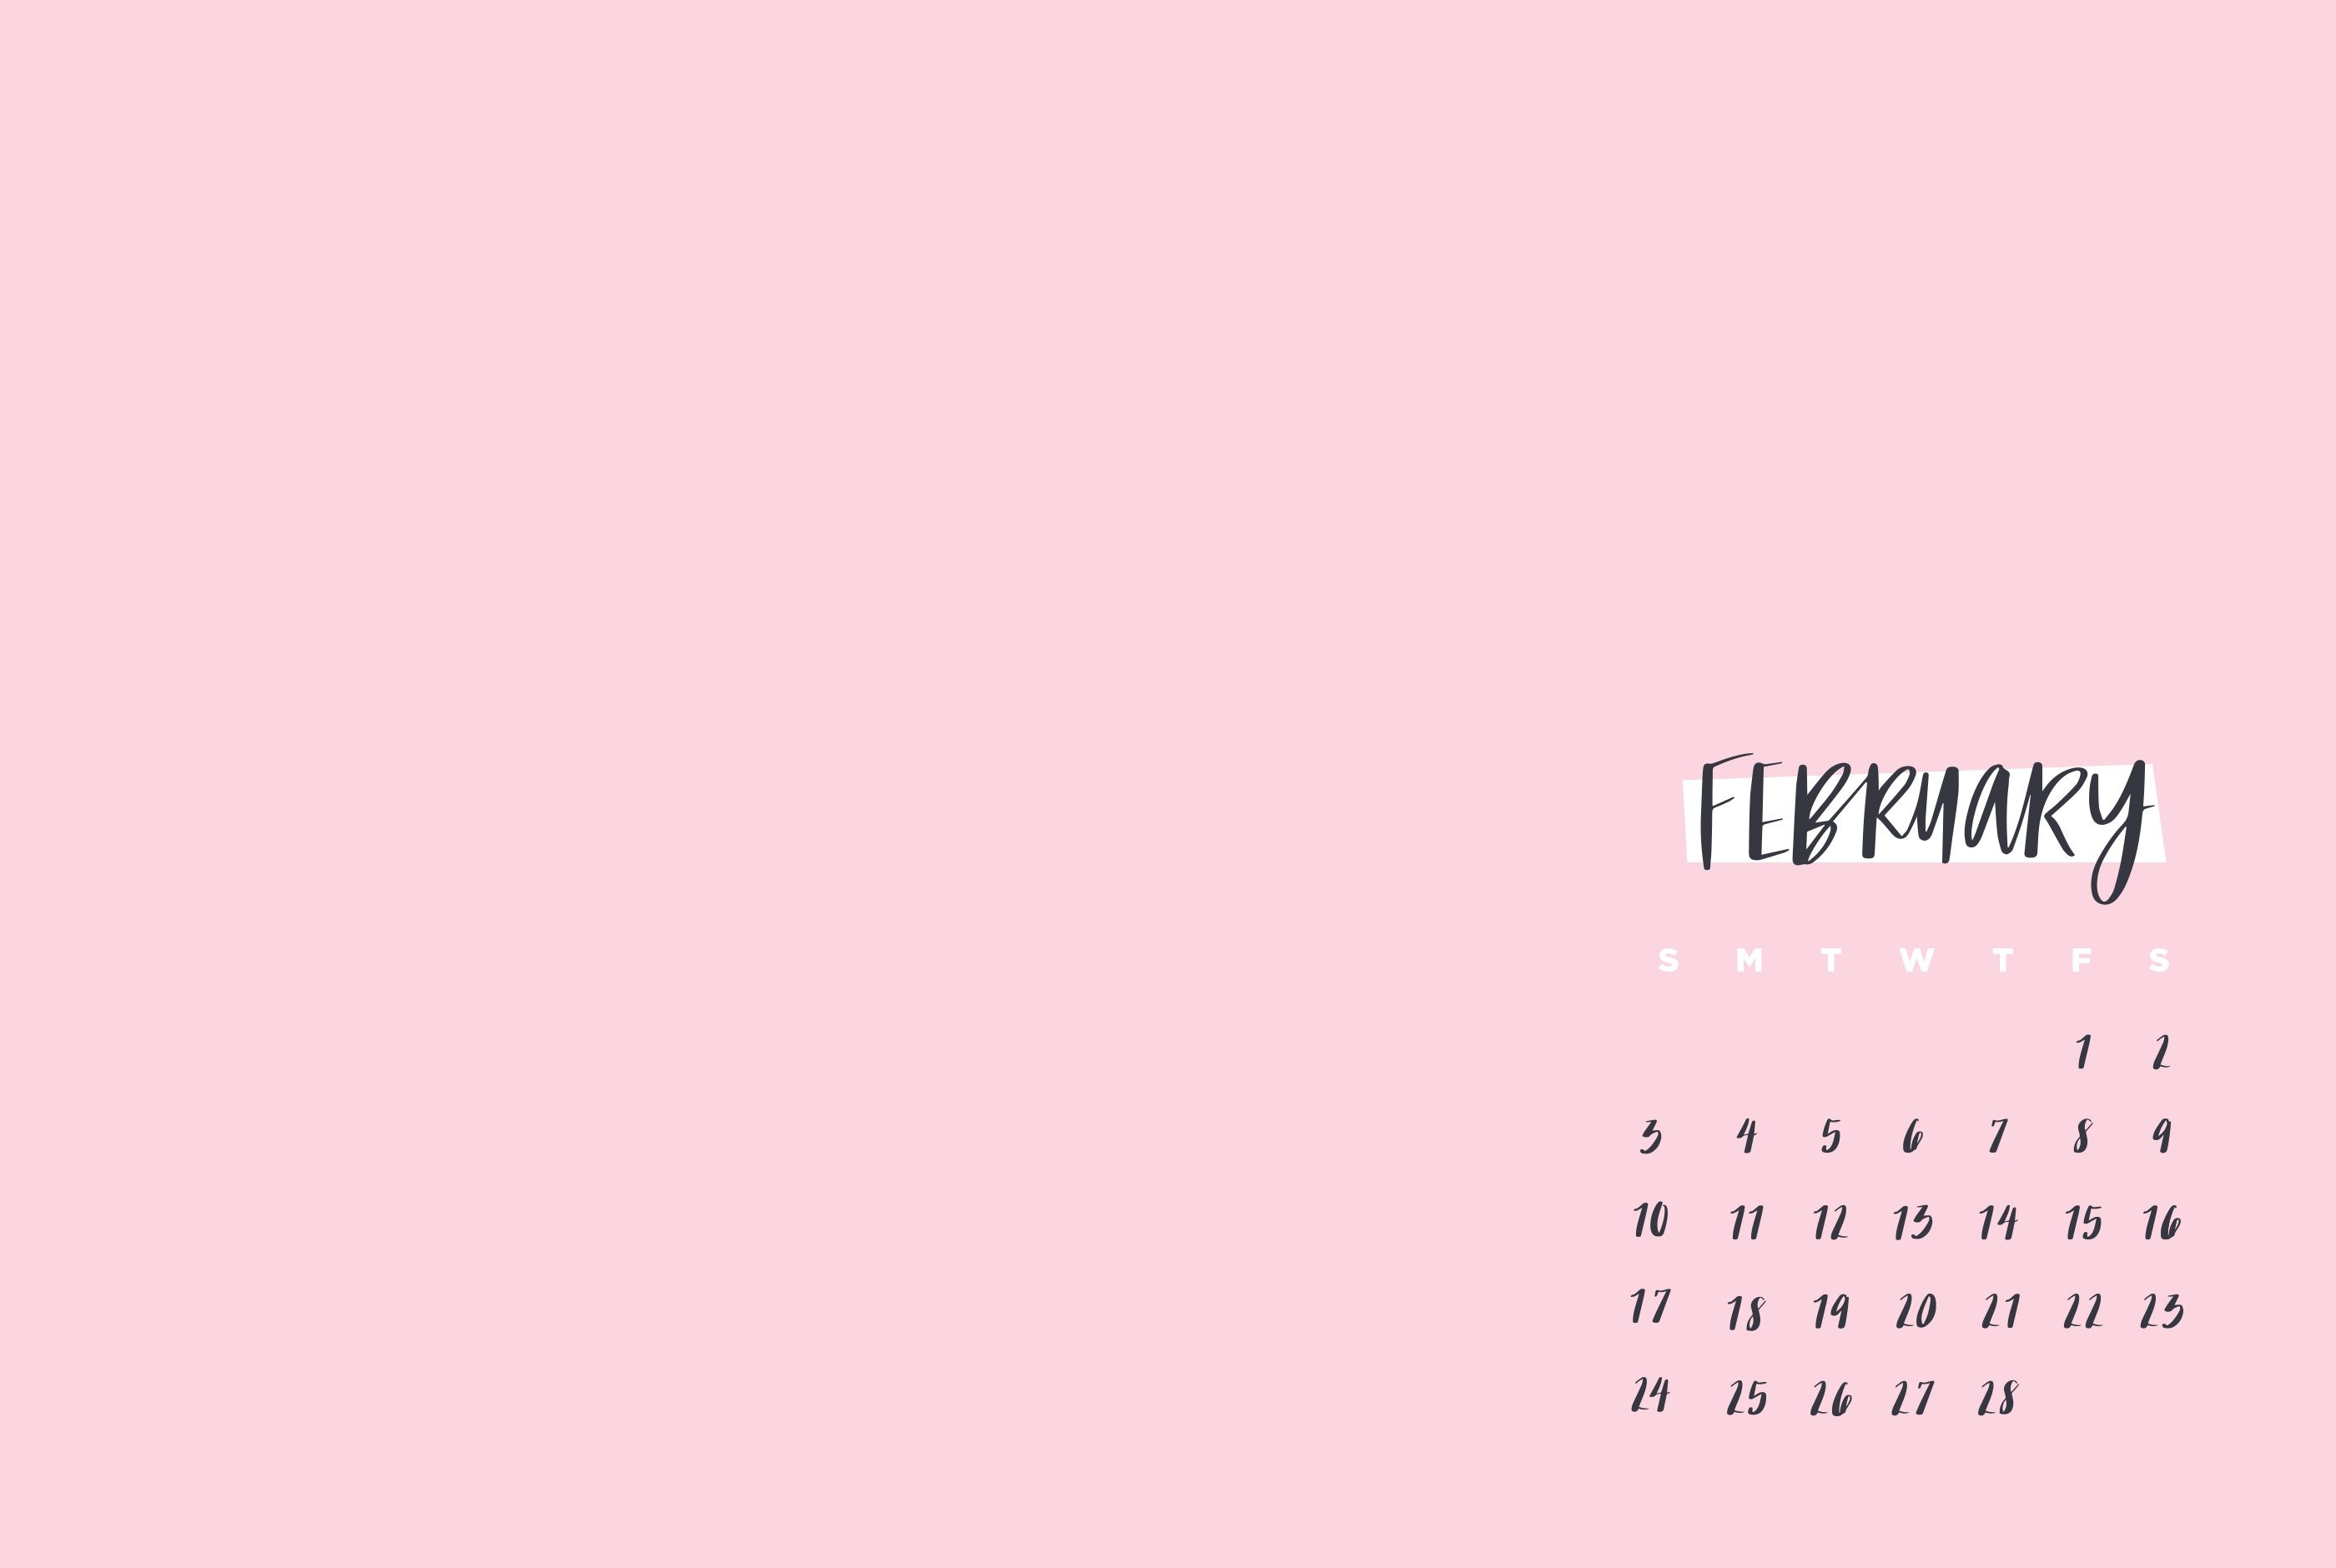 February Wallpaper Calendar 2019 February 2019 Calendar Wallpaper | MaxCalendars in 2019 | Calendar